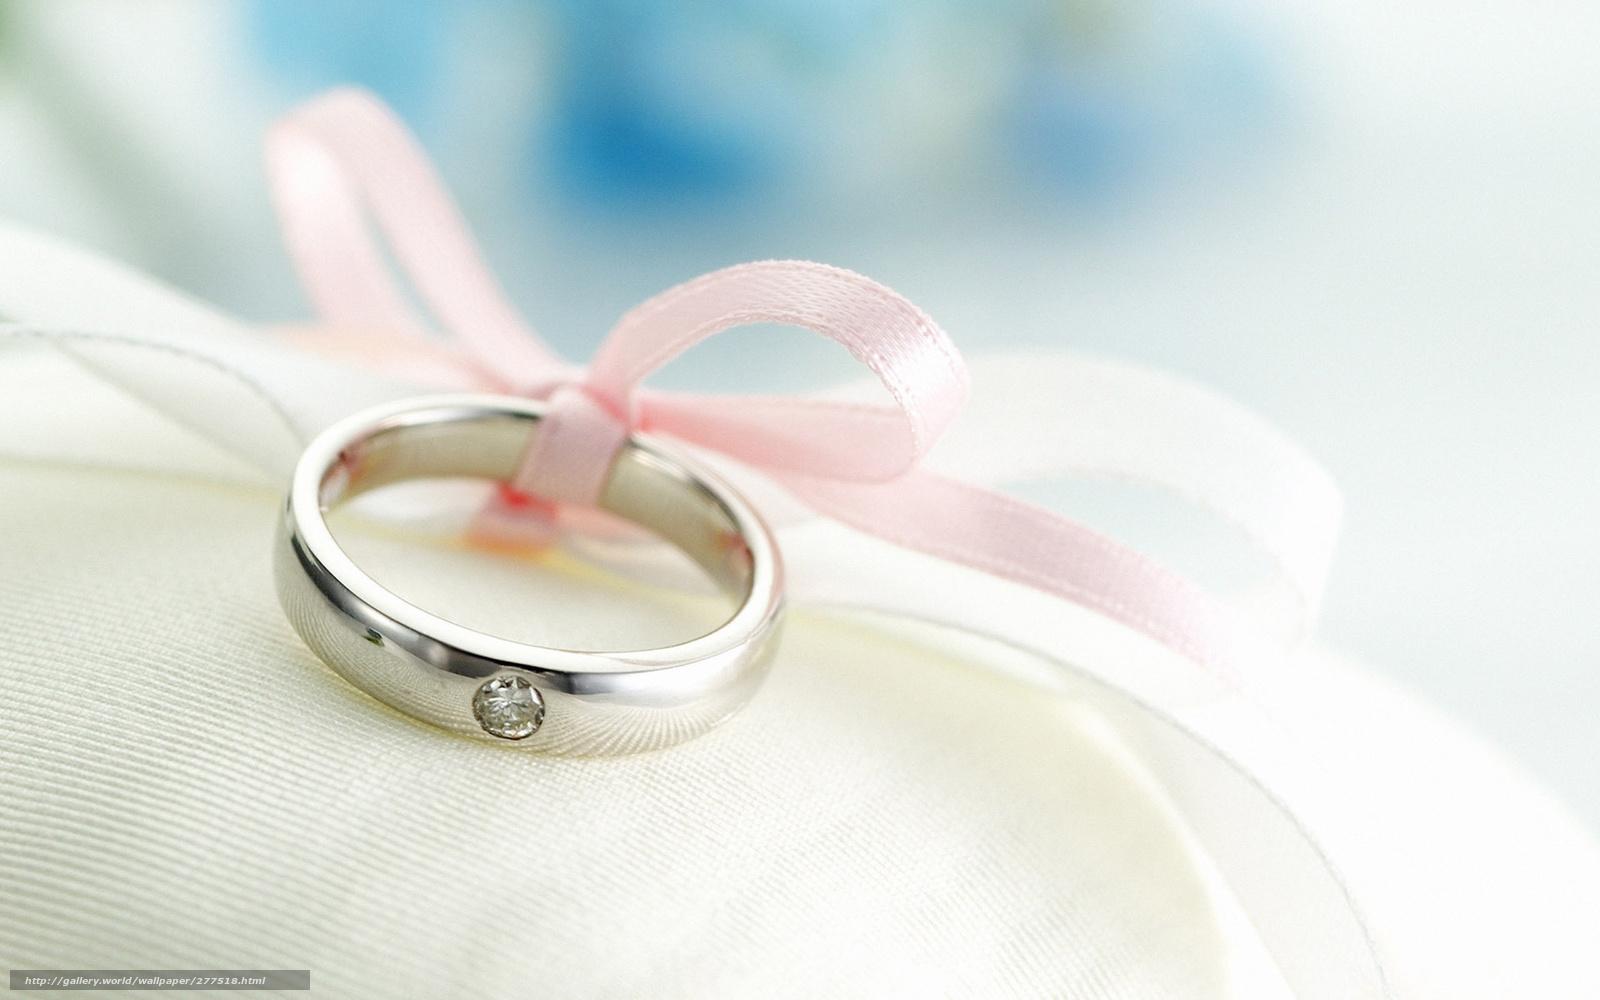 Tlcharger Fond decran anneau, mariage, arc, tendresse Fonds decran ...